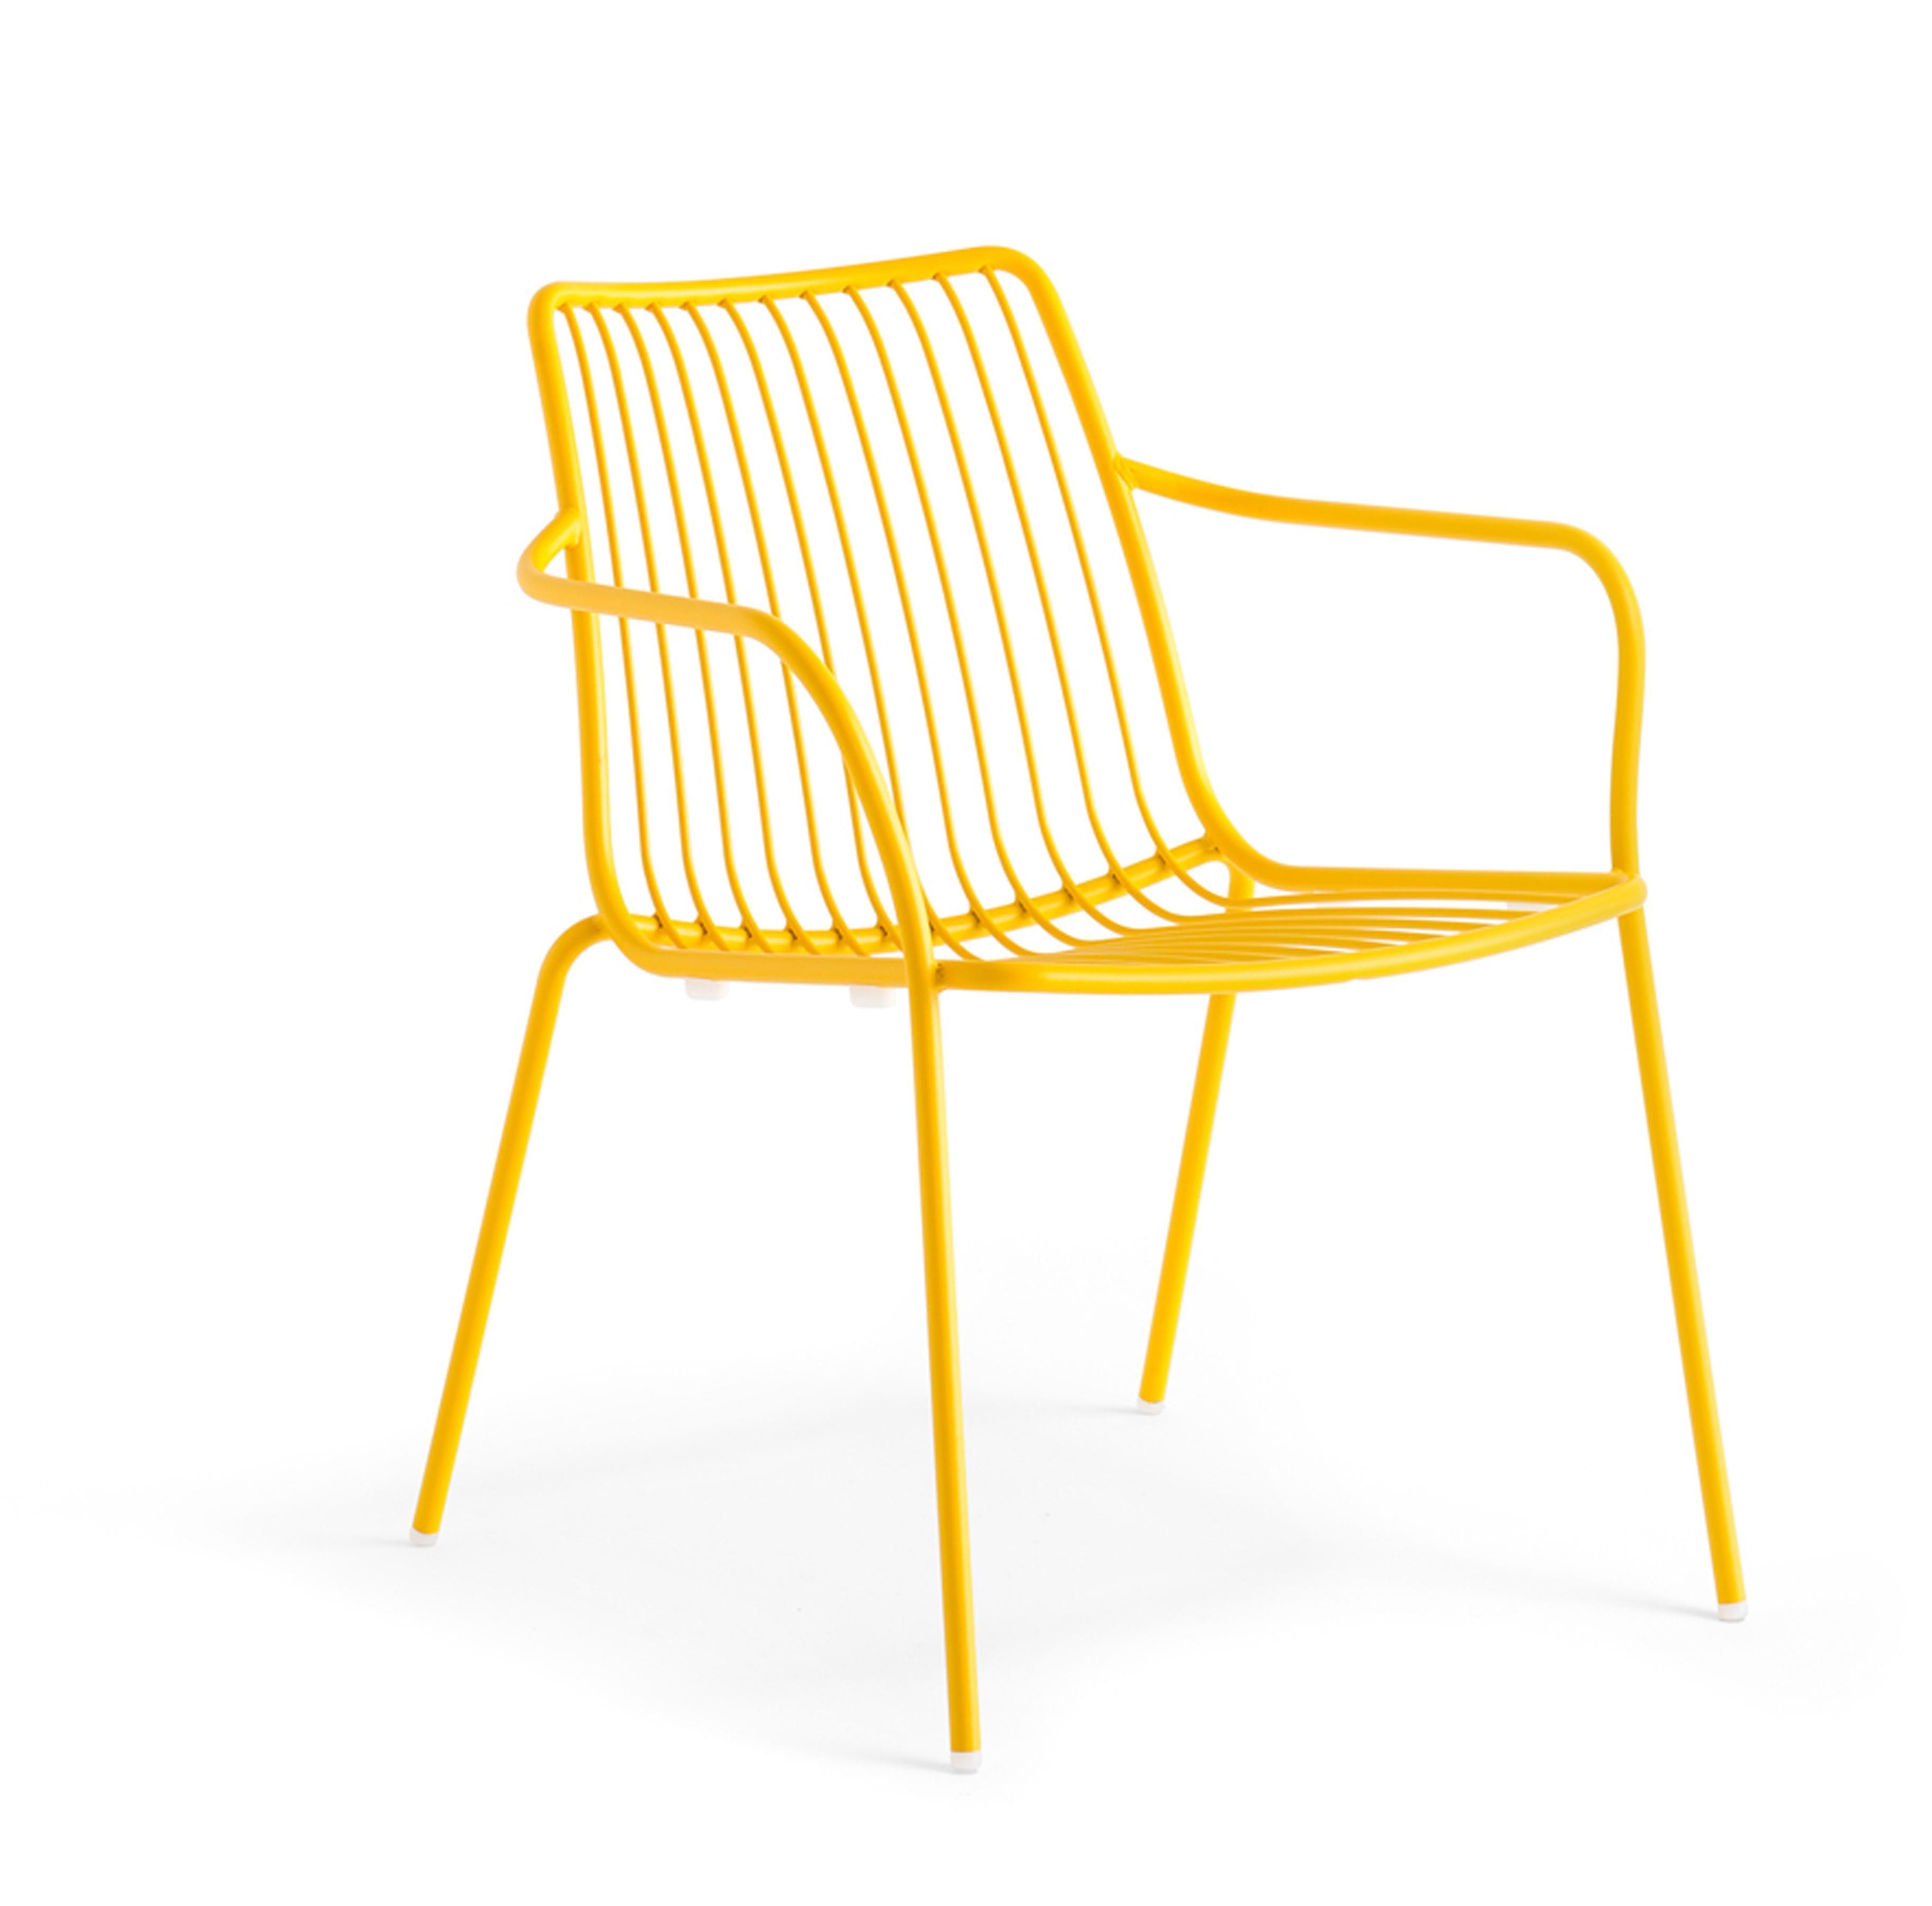 Sessel Gelb Metall Mit Armlehne Stapelbar Garten Sessel Lounge